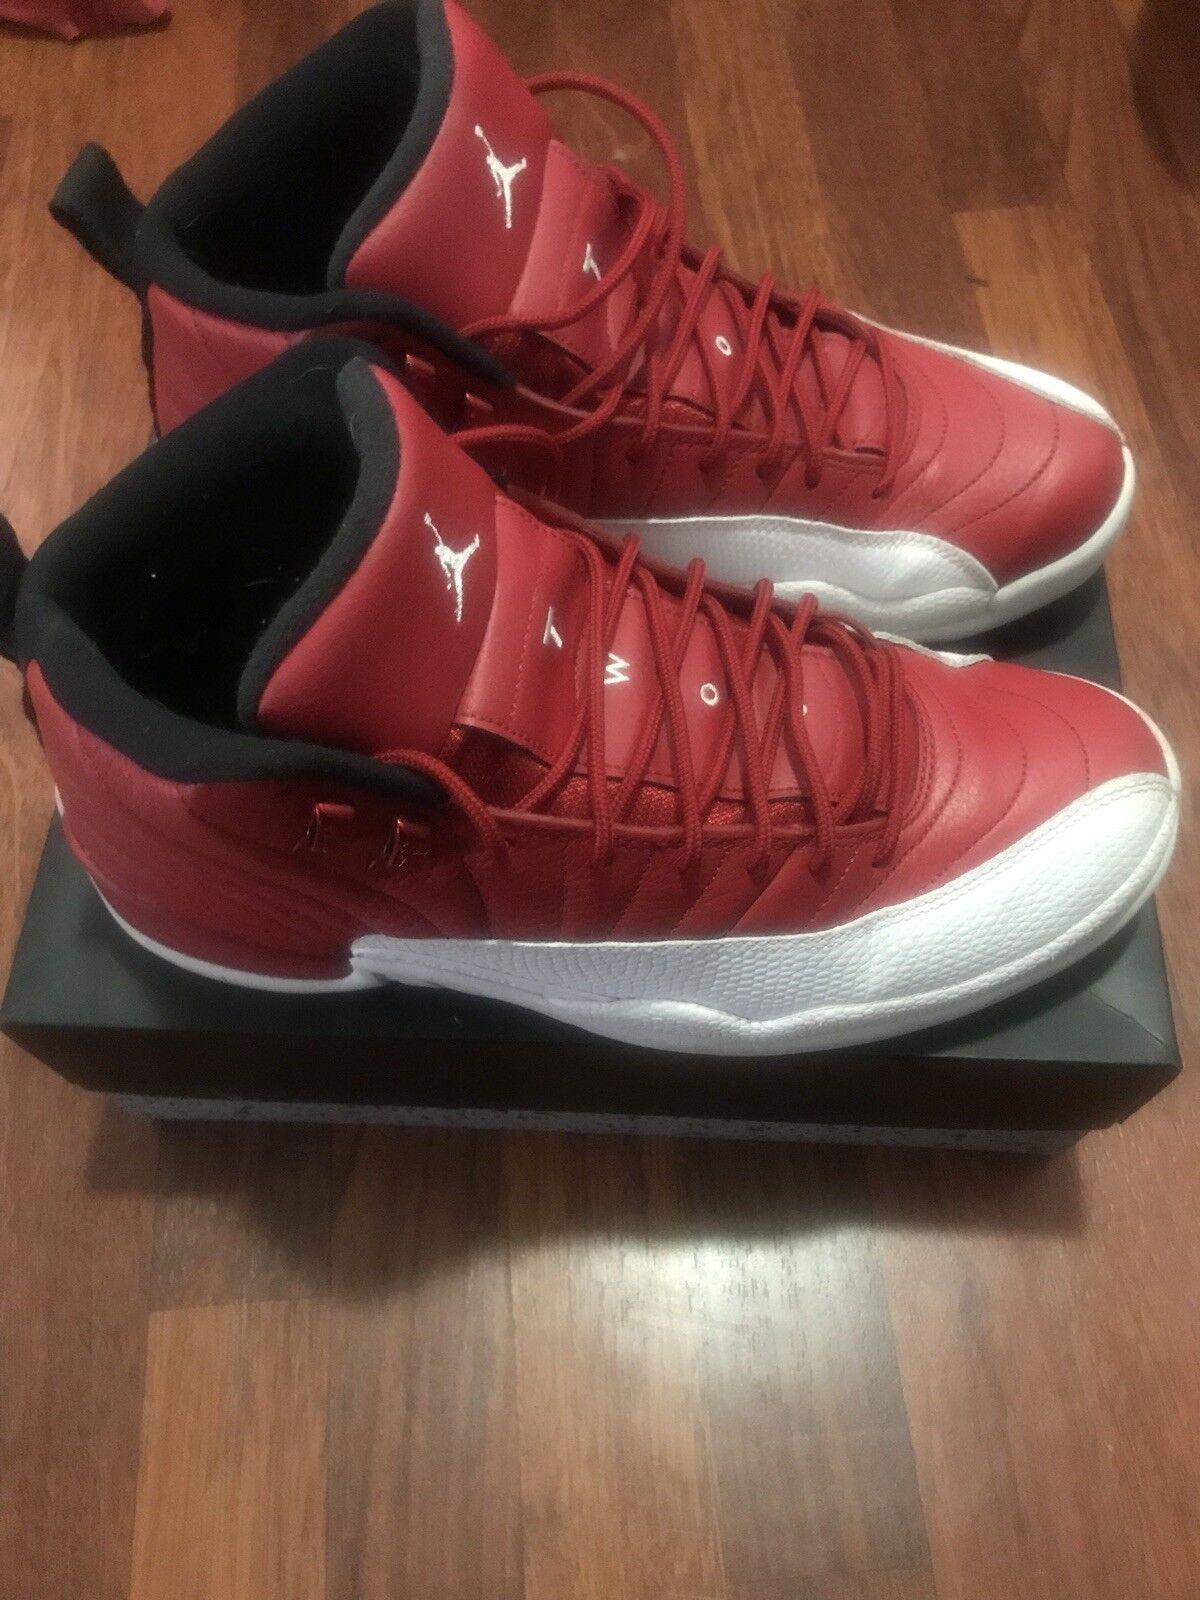 Mens scarpe da ginnastica Jordans 11 Dimensione 10.5 rosso And And And bianca 120fac